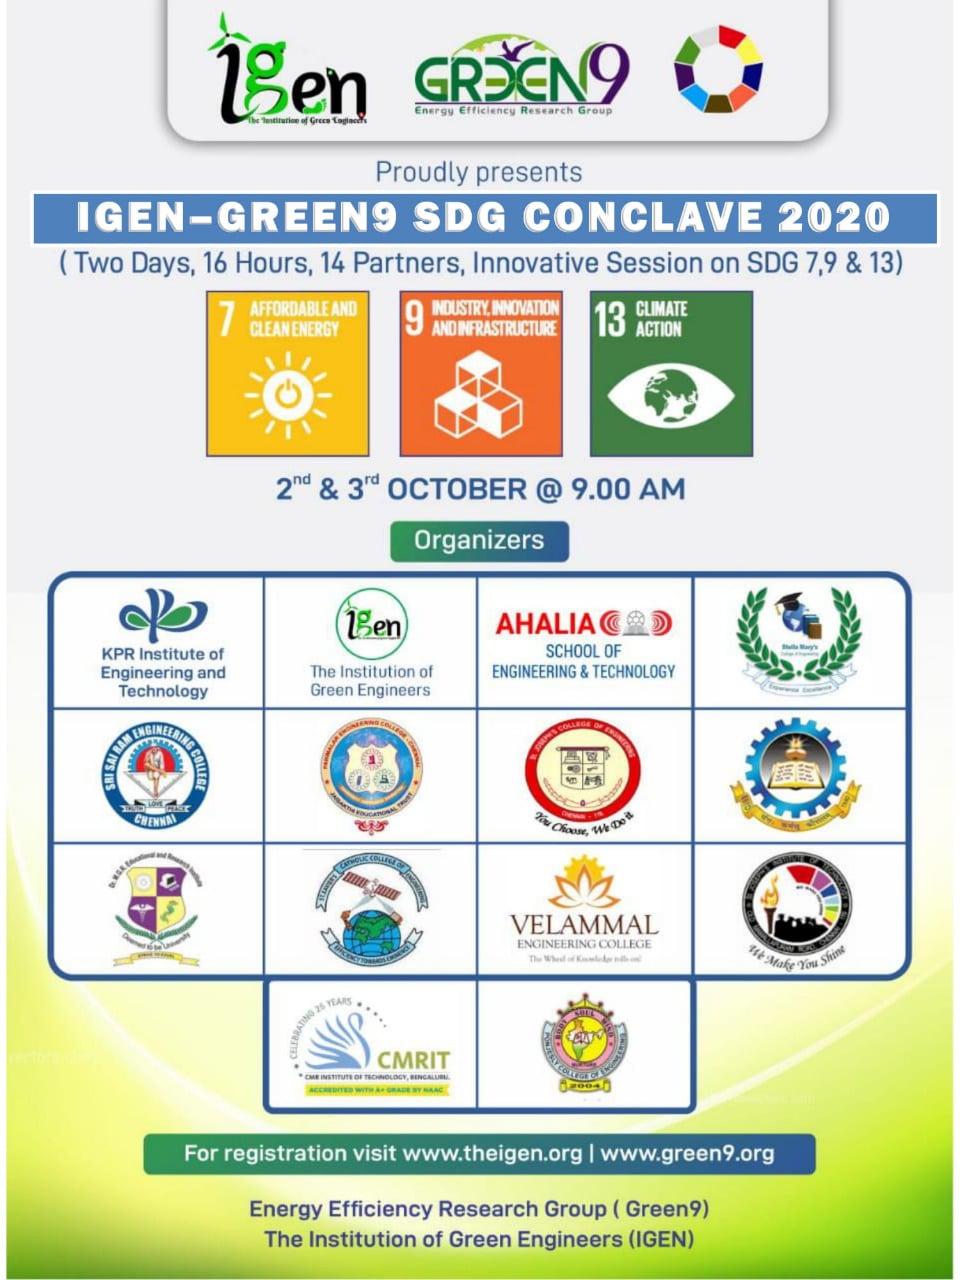 IGEN – Green9 SDG Conclave 2020